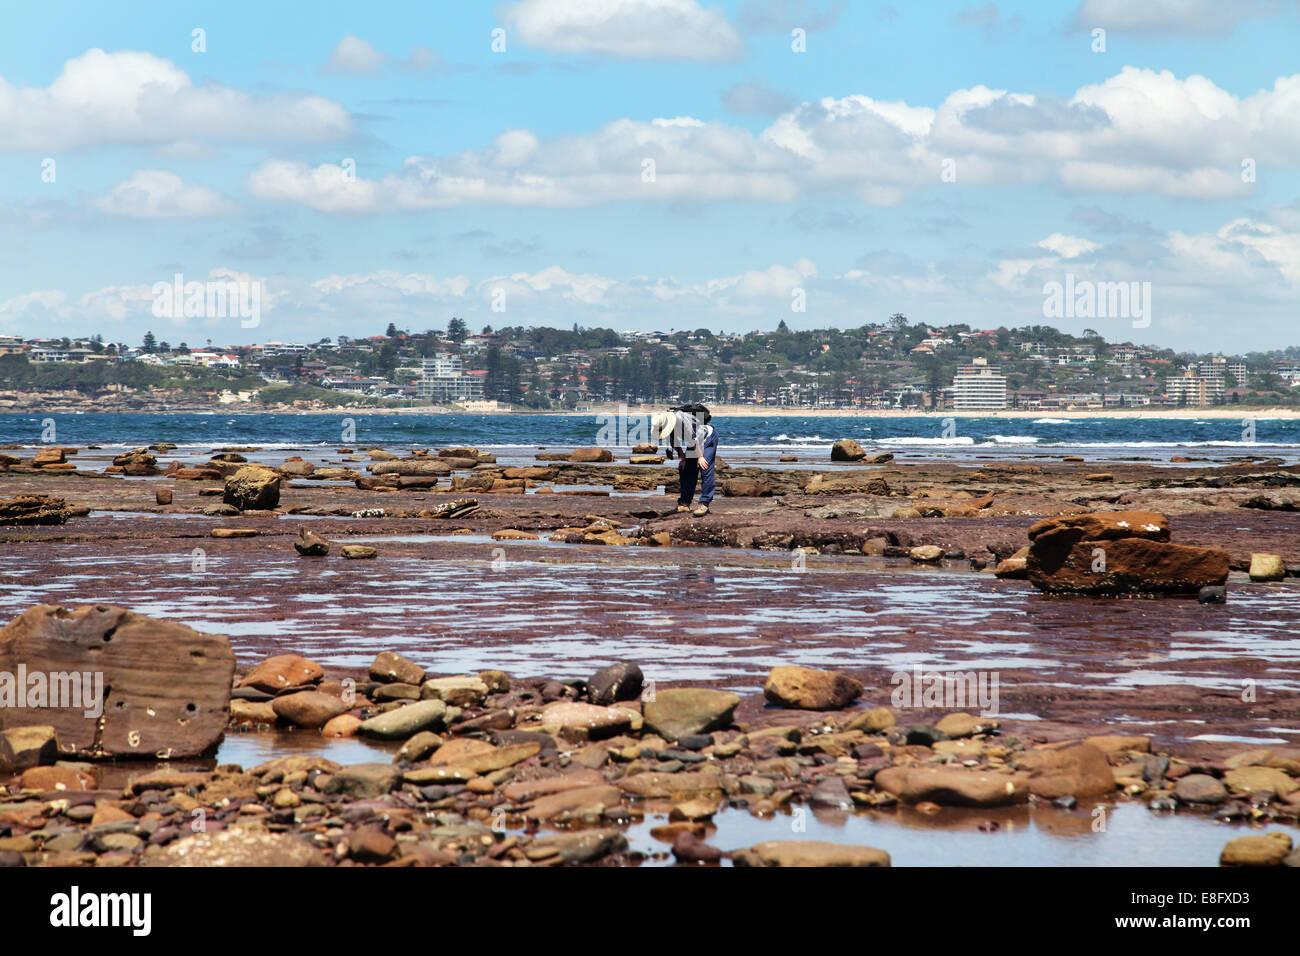 Australia, Nuovo Galles del Sud, Sydney, Man standing by ocean - Stock Image